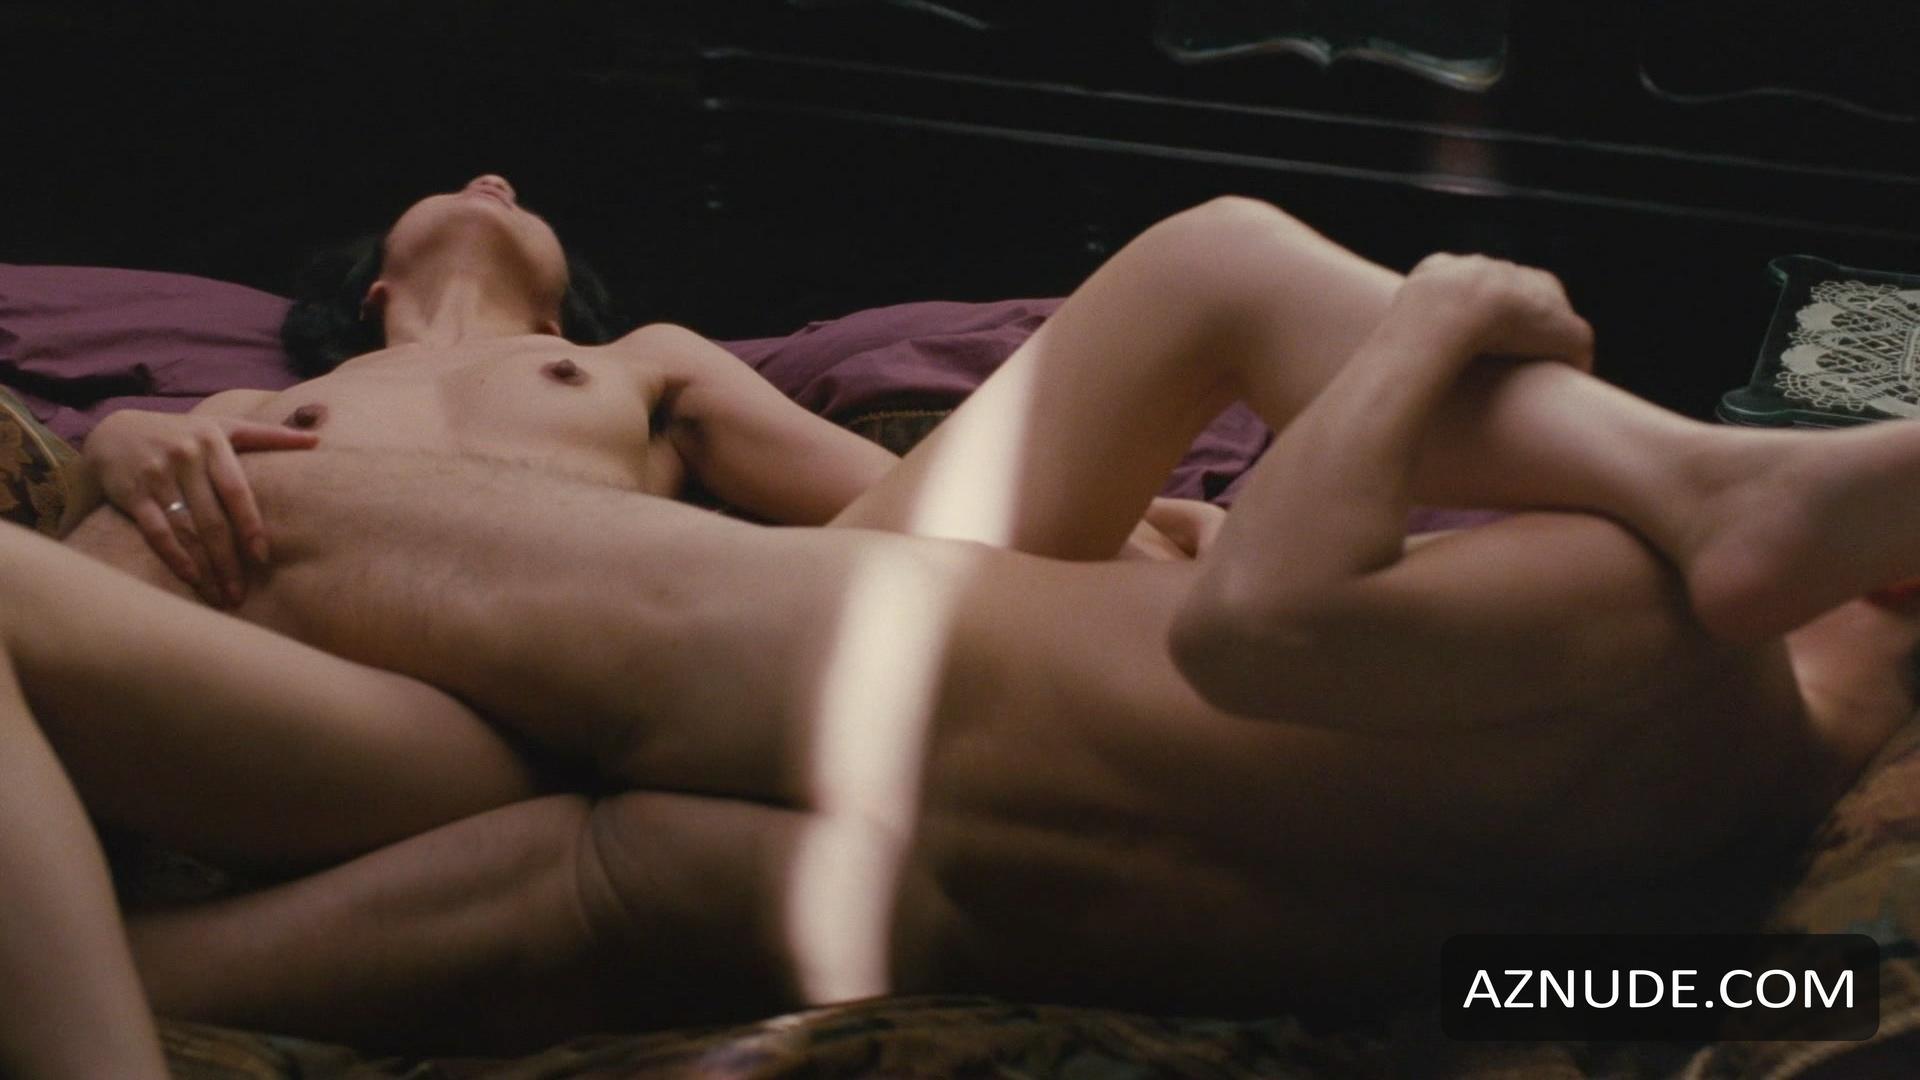 Melonie diaz sex scene discuss impossible